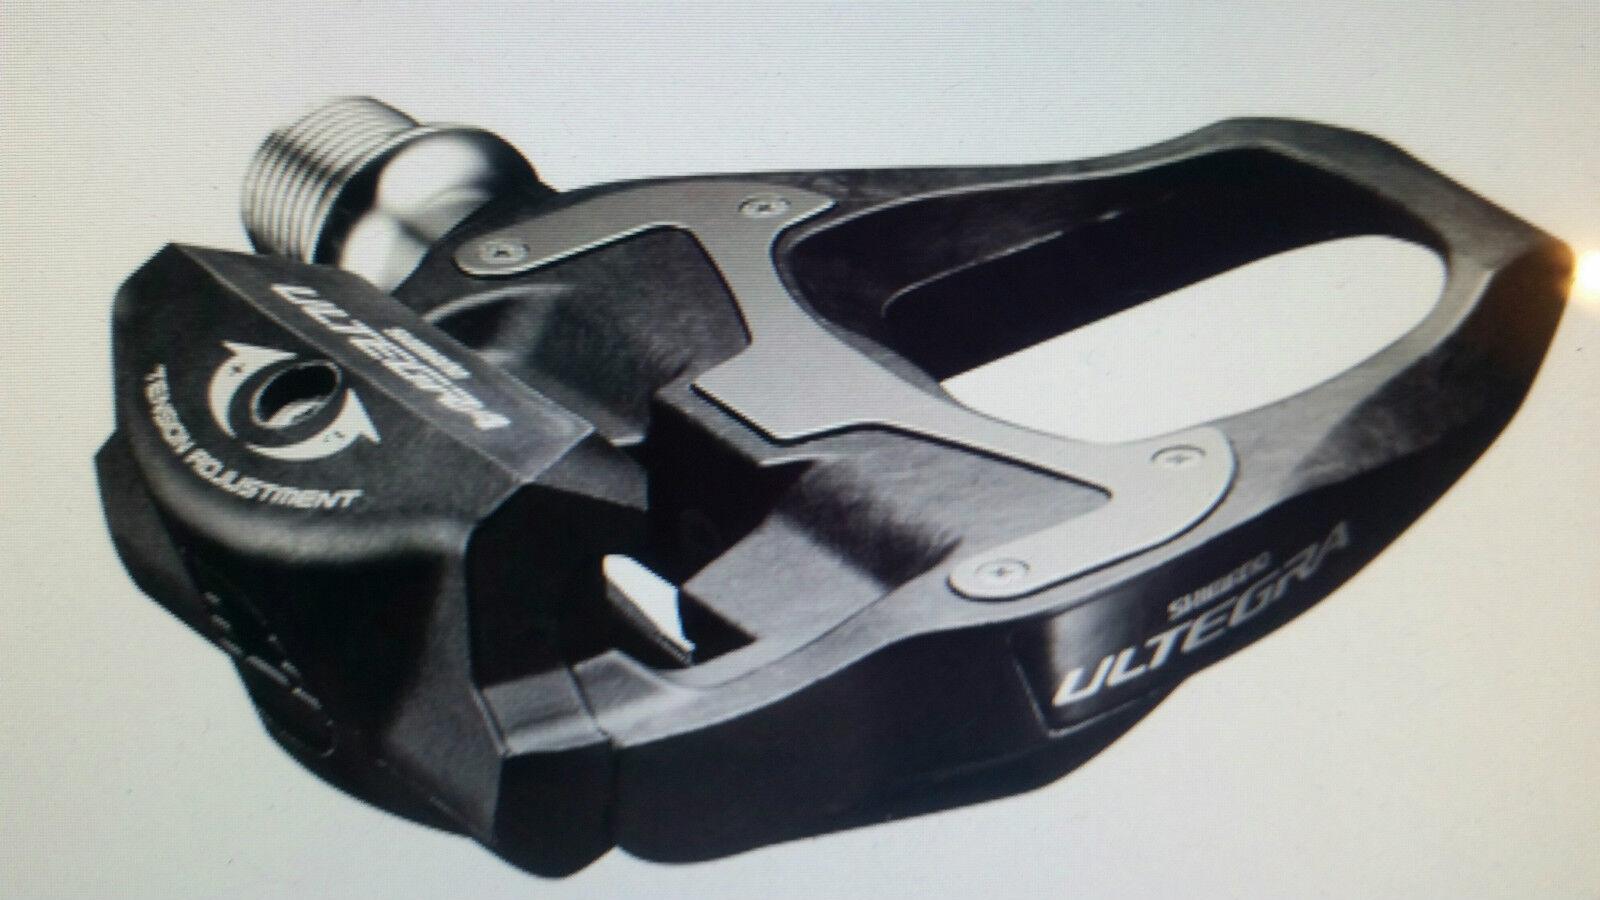 Coppia di pedali SHIMANO Pair Pedals Race ULTEGRA PD-6800   reasonable price